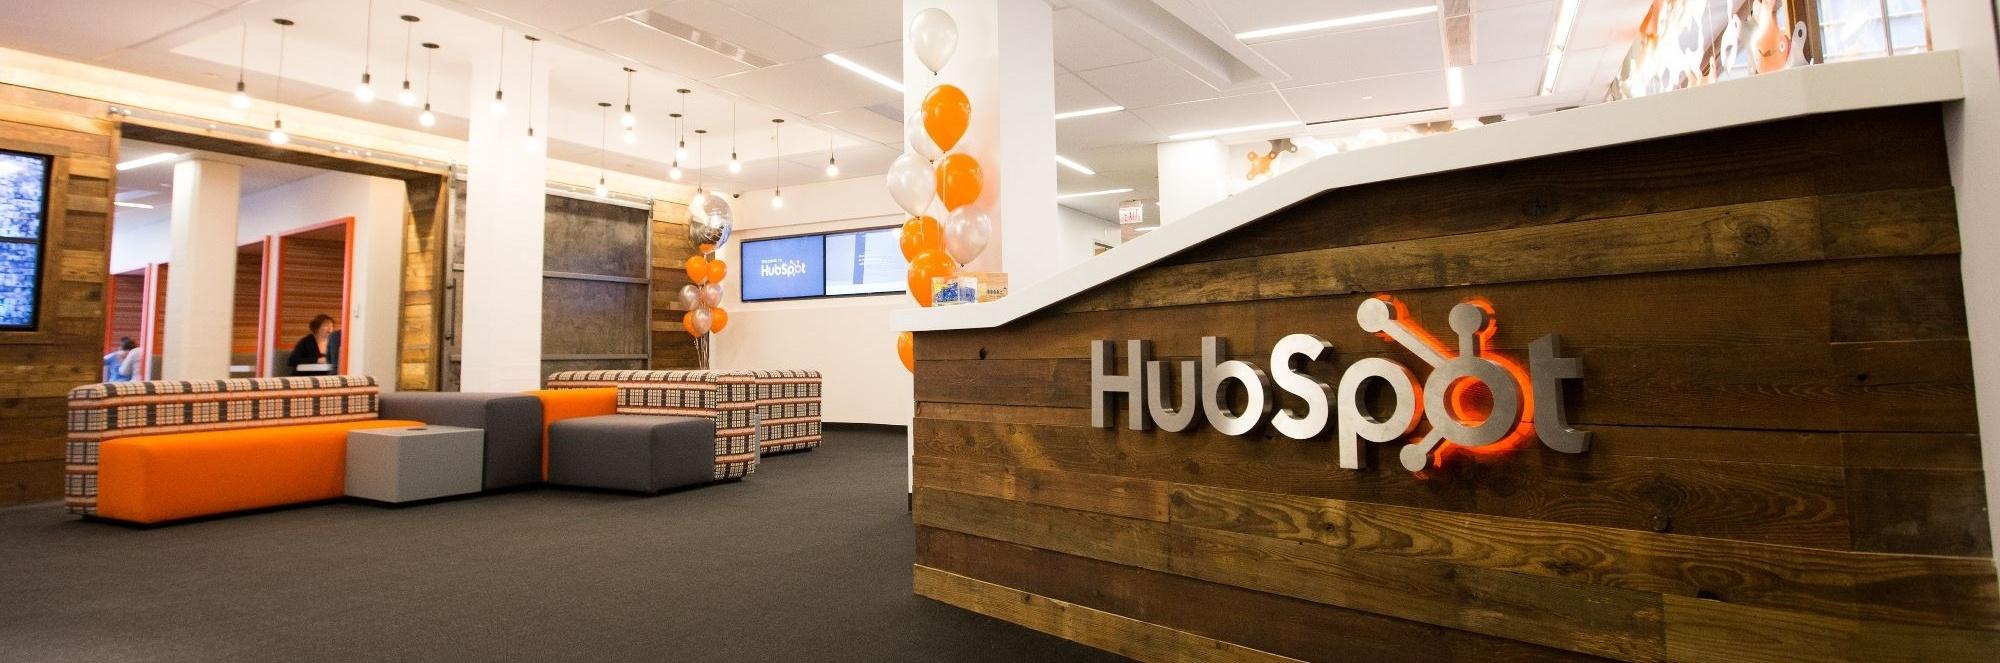 HubSpot Consultancy London